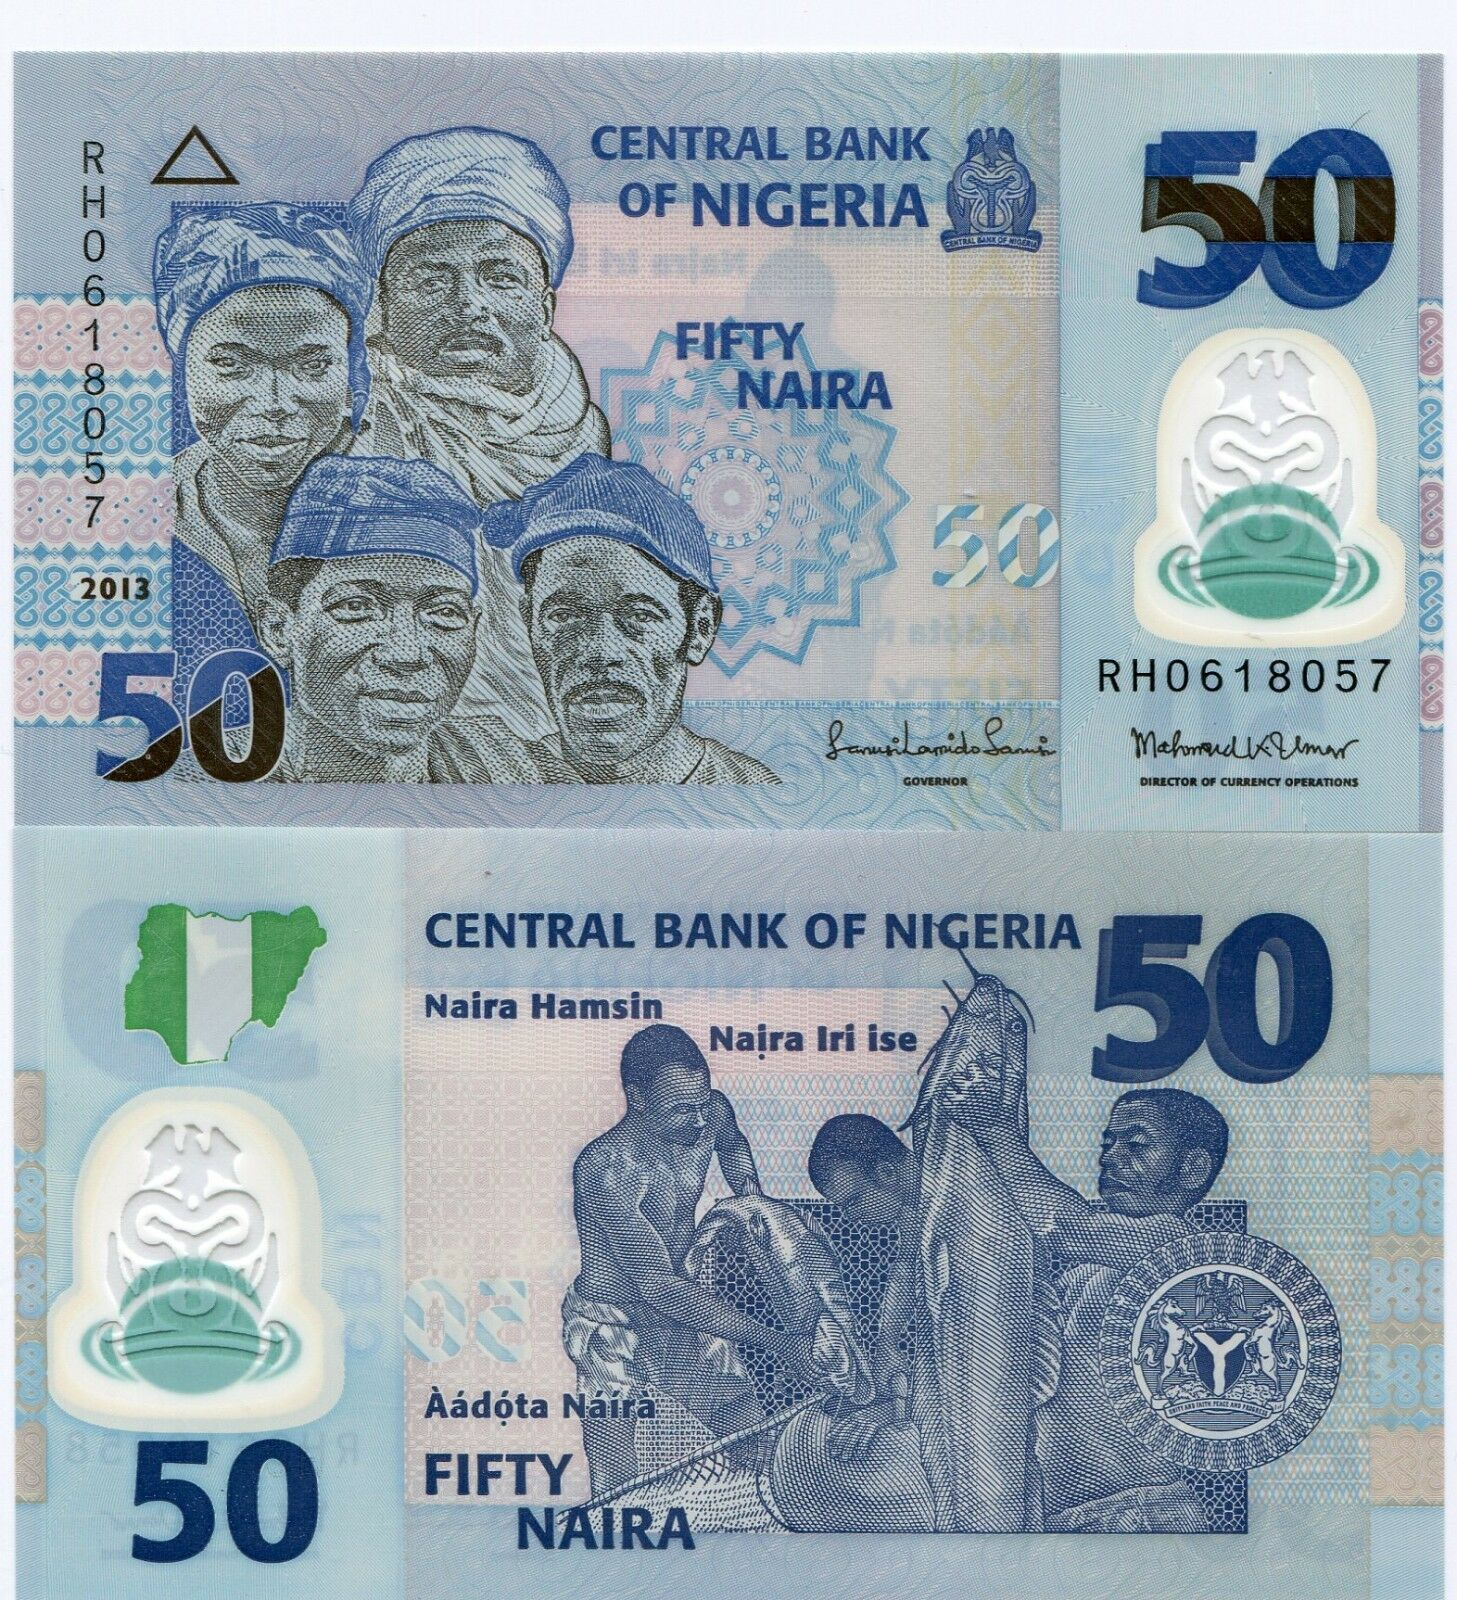 Nigeria Unc 50 Naira Polymer Money